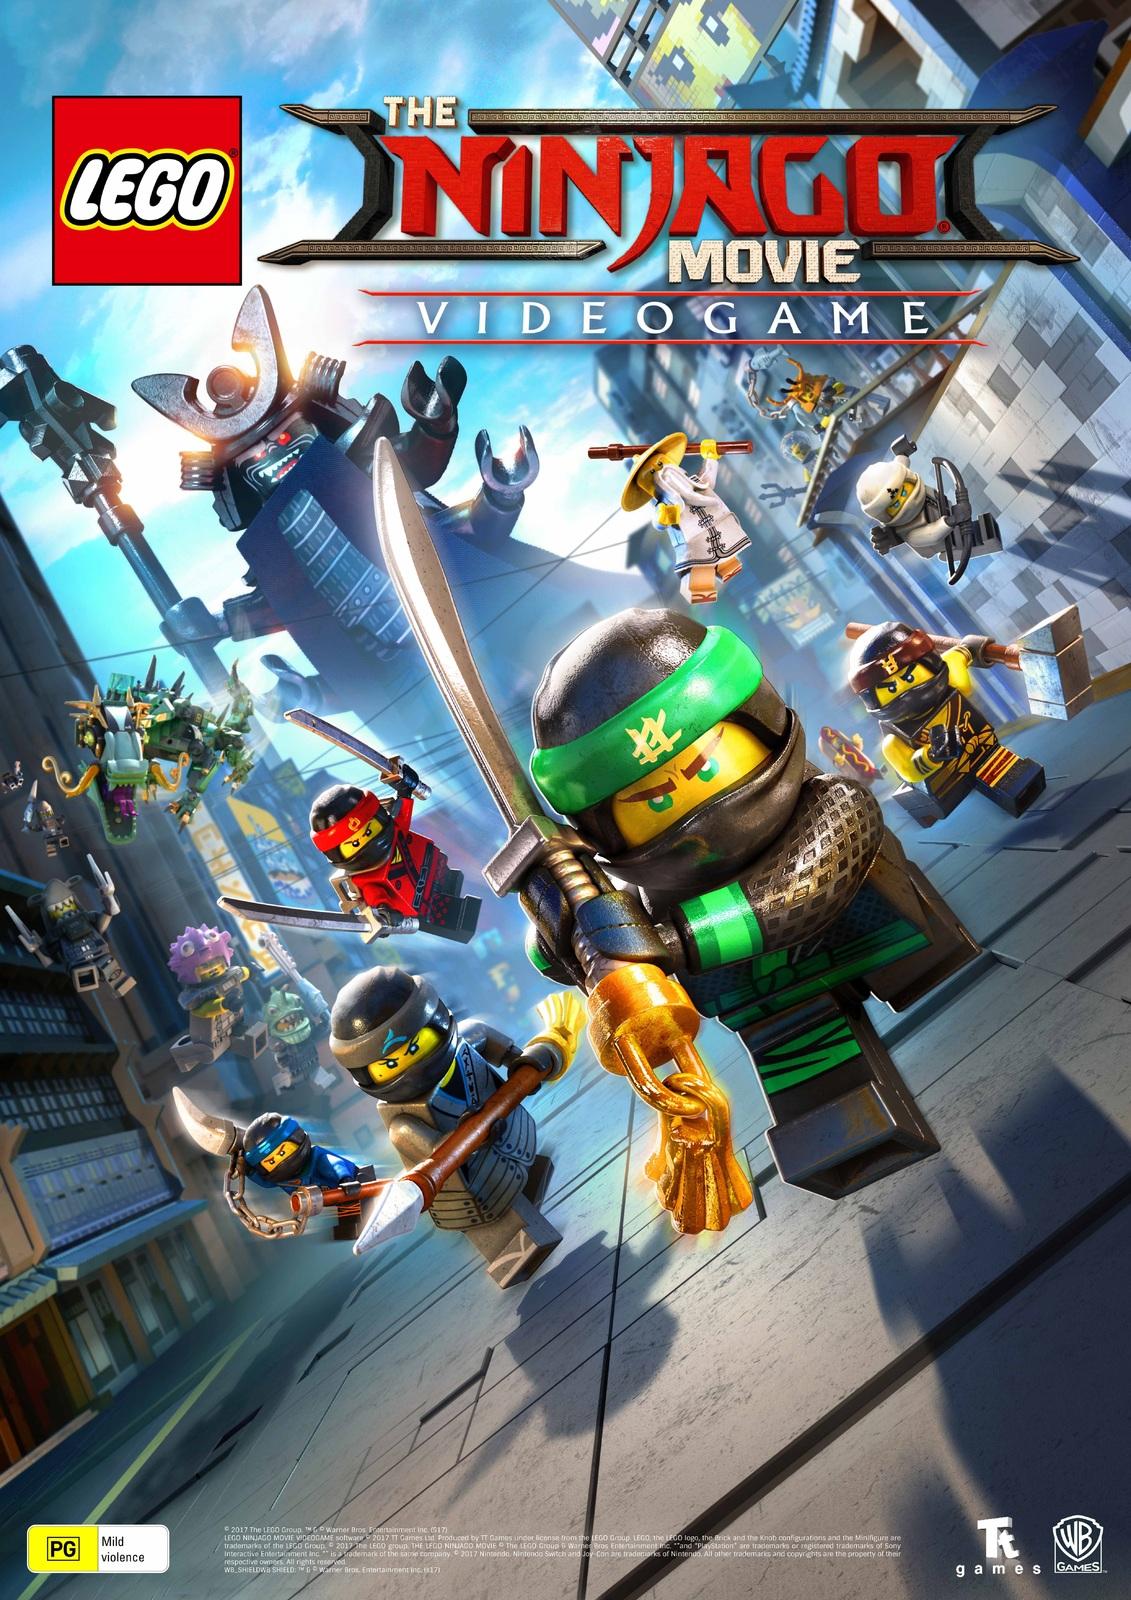 LEGO Ninjago Movie Poster! image